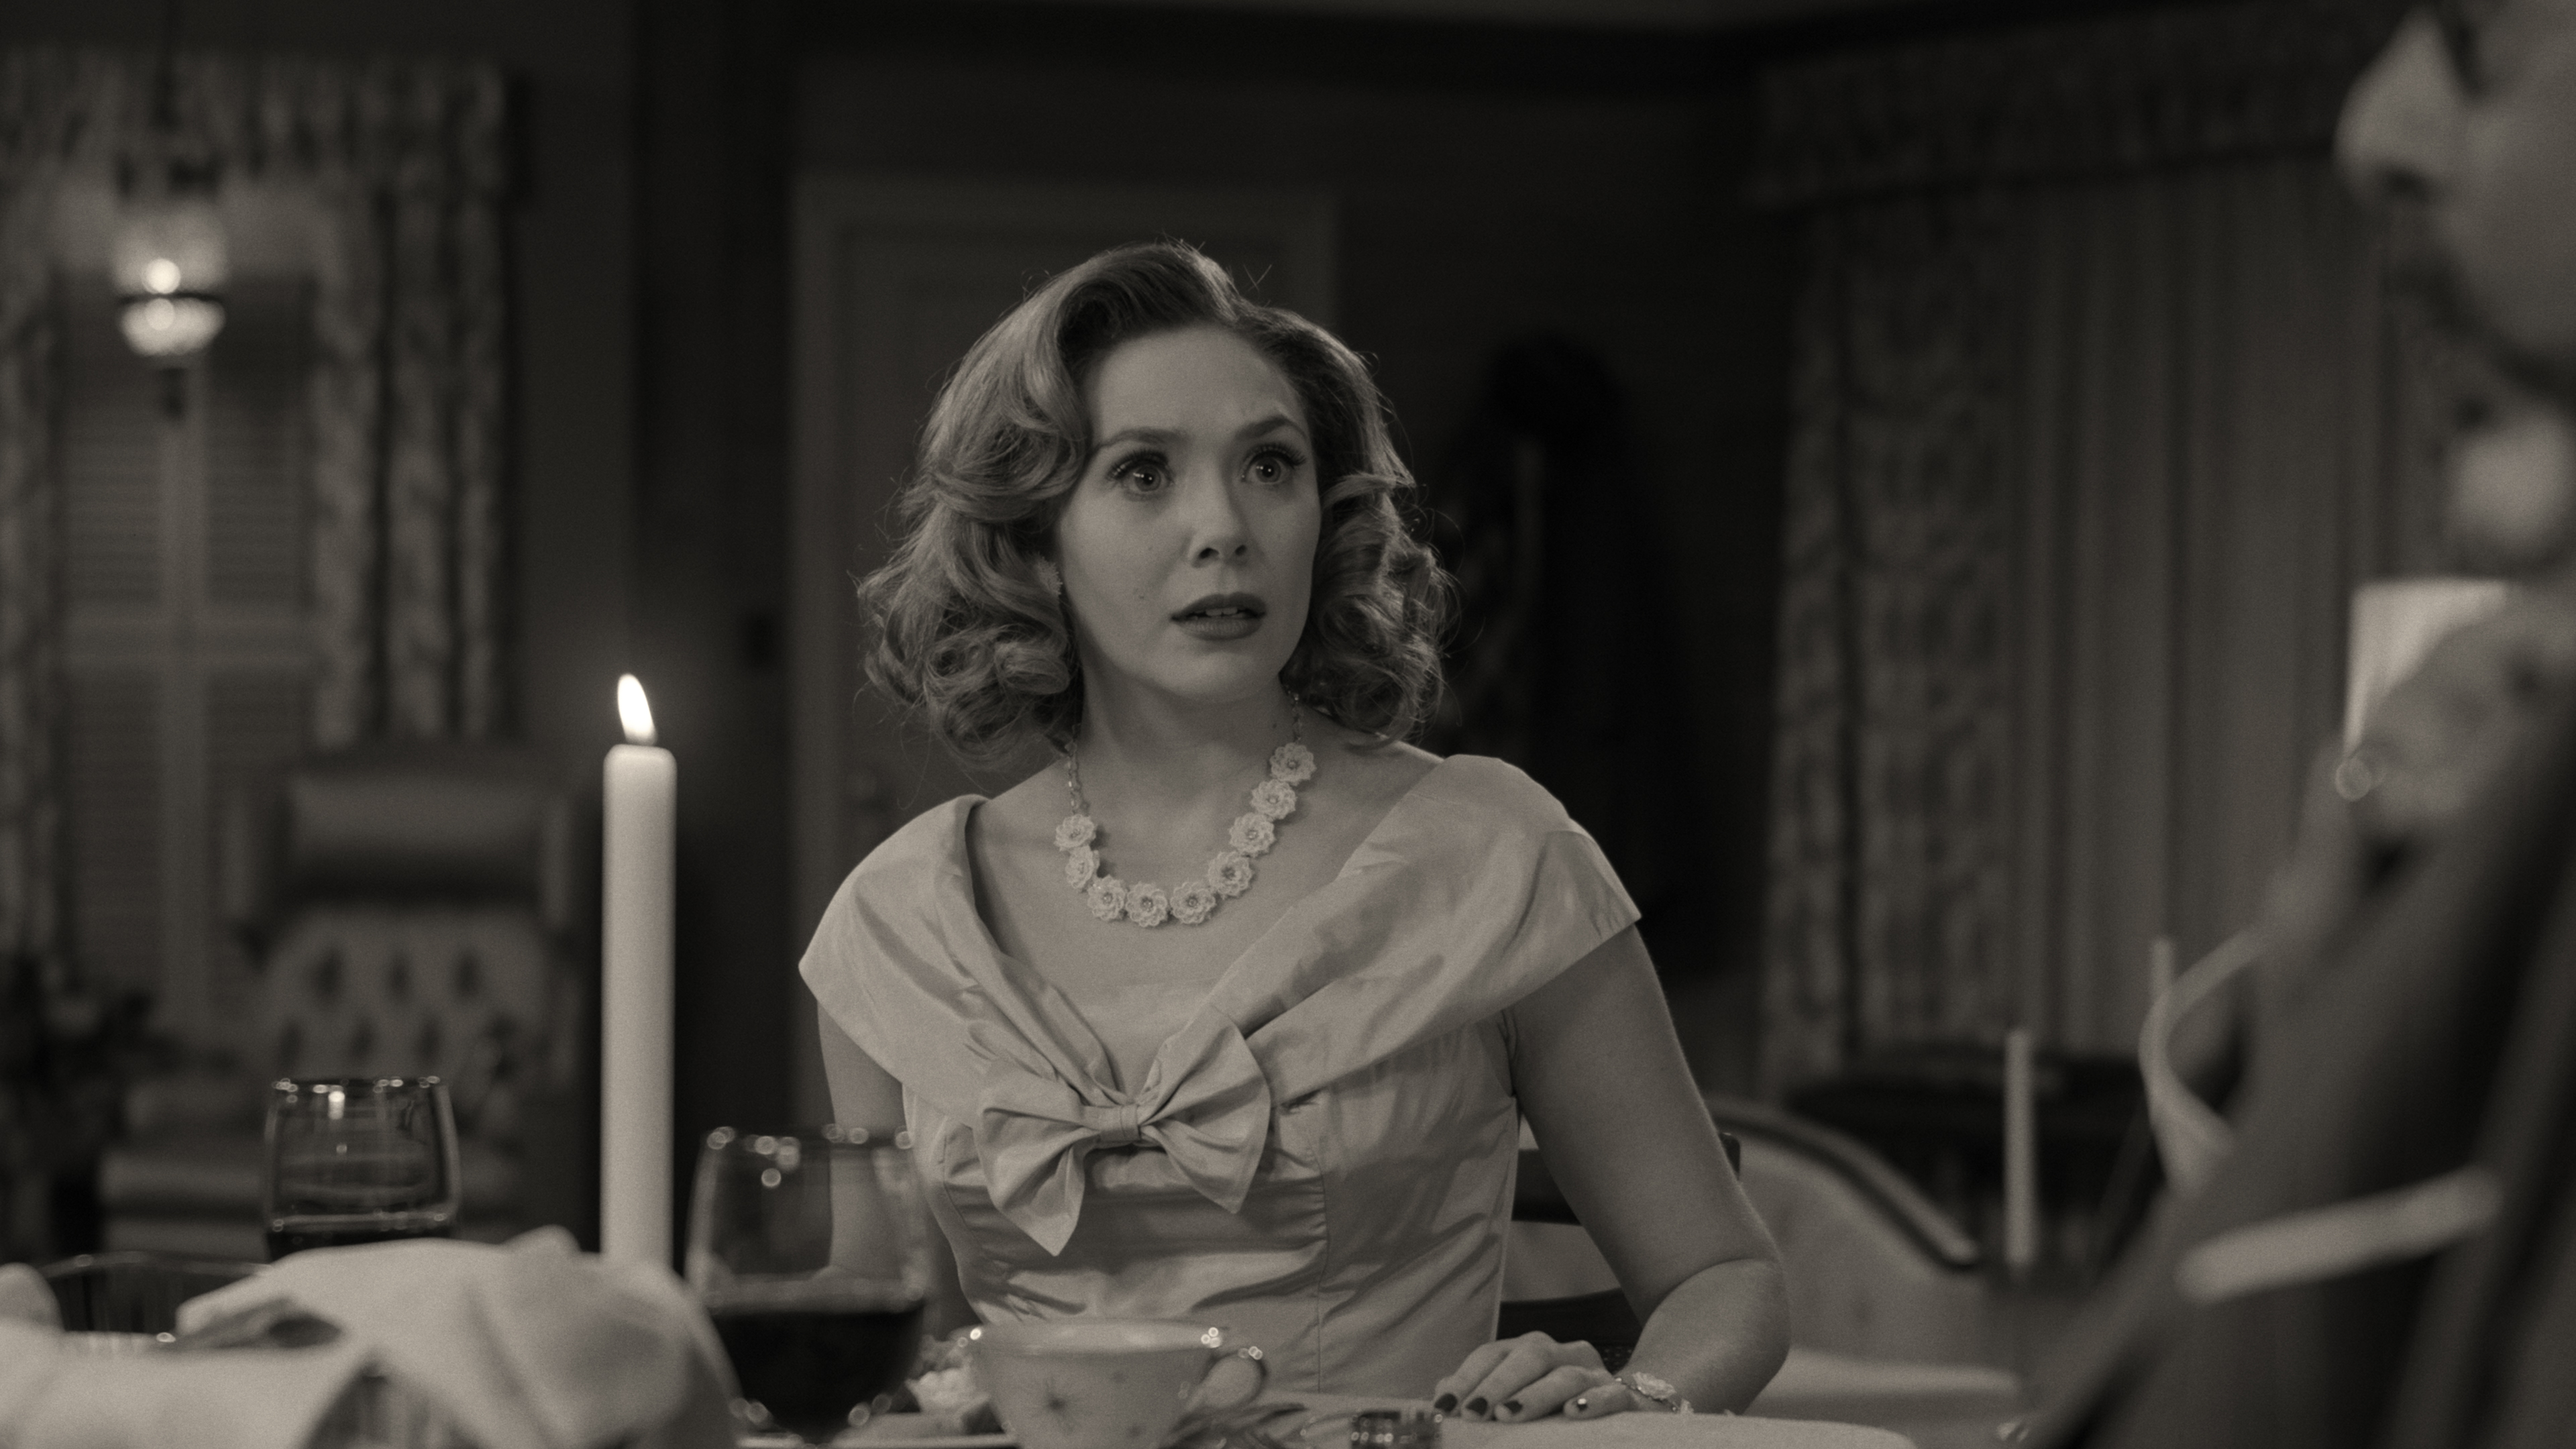 Elizabeth Olsen in WandaVision (2021)